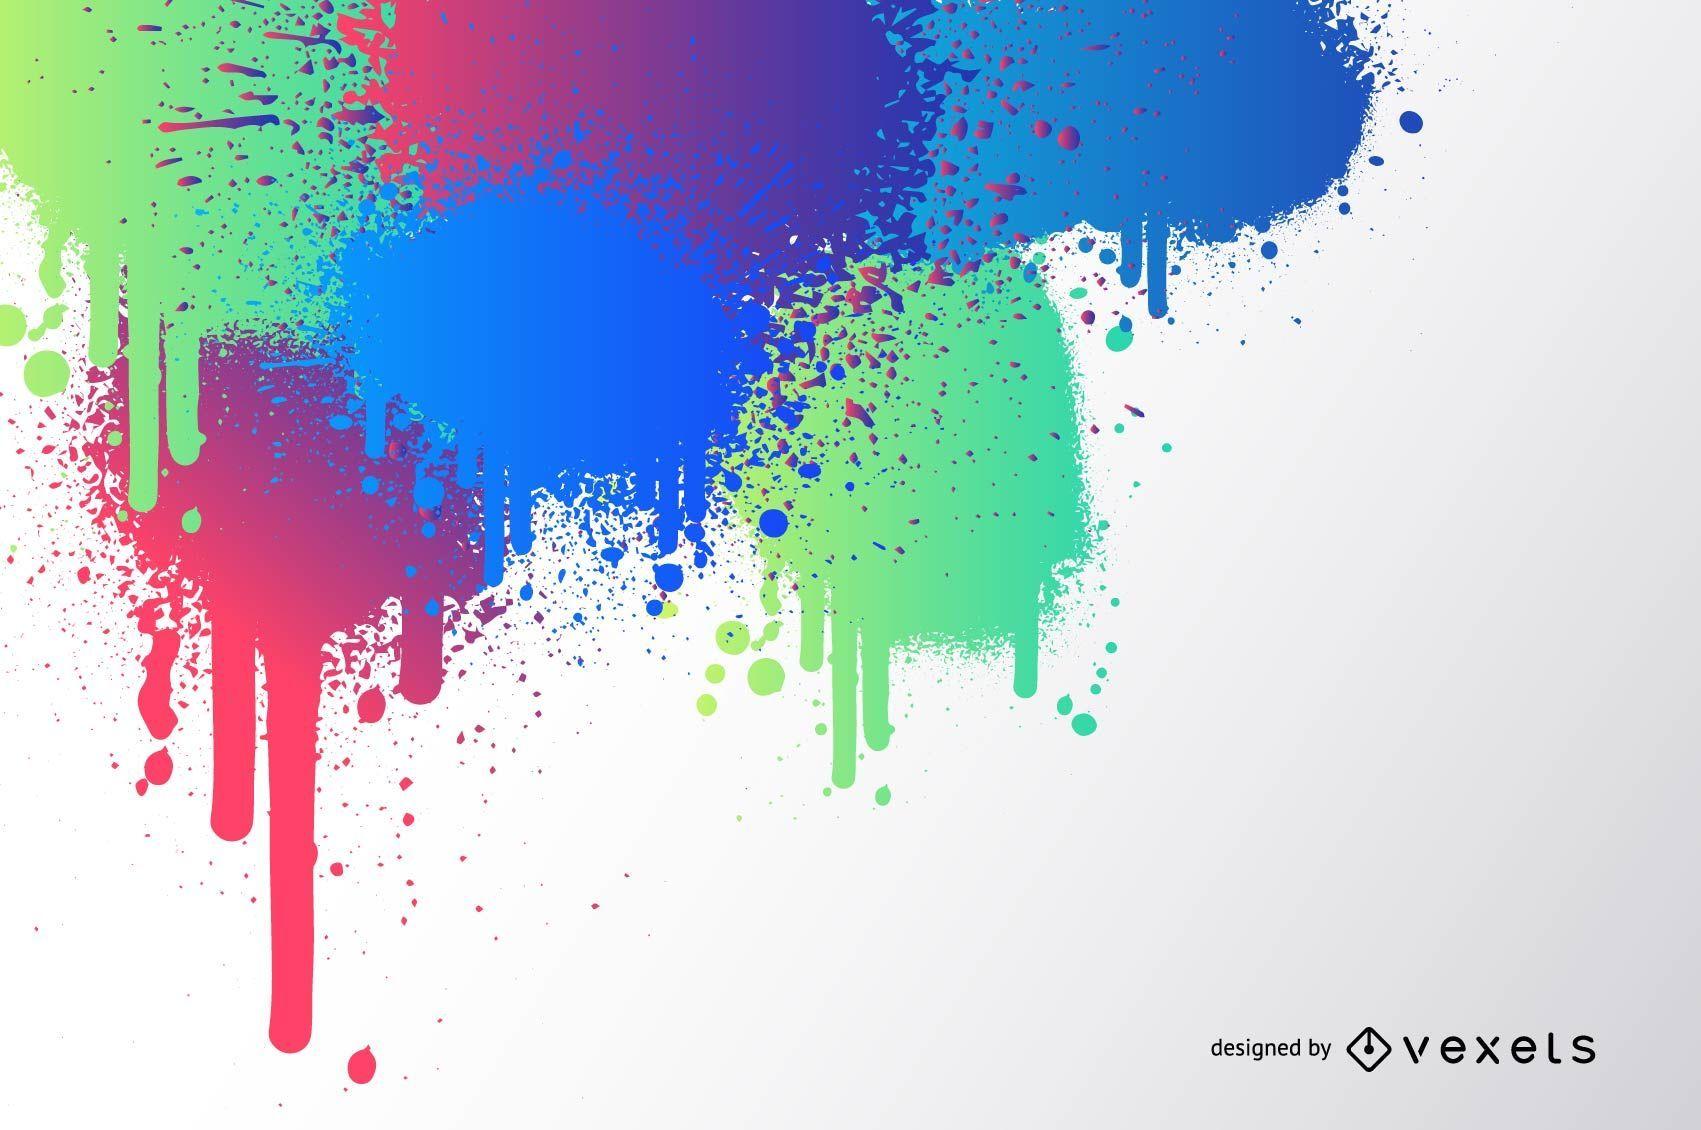 Colorful Splashed Paint Splatter Background